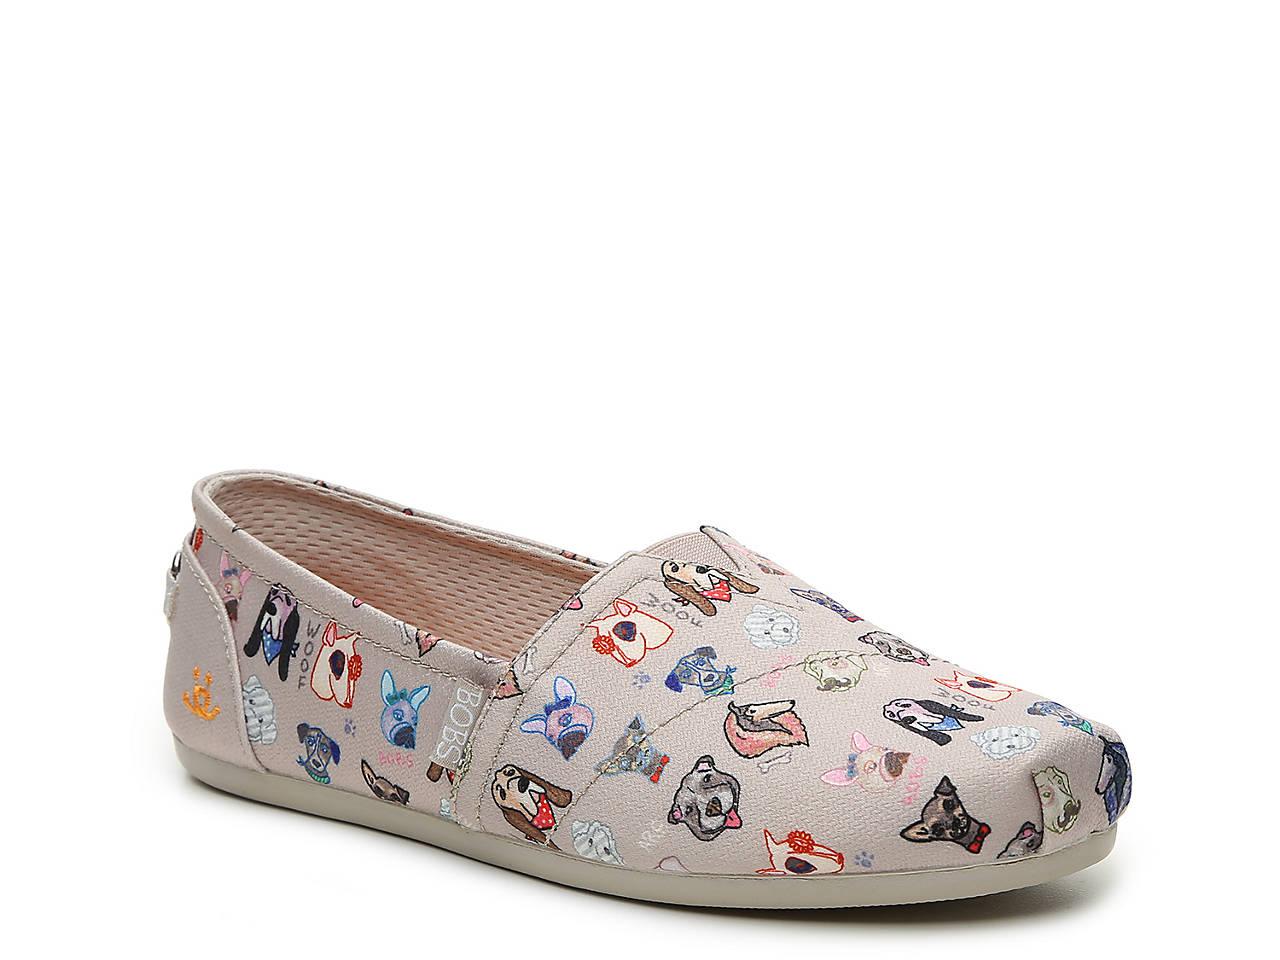 d613f24c4ac3 Skechers BOBS Plush Posh Pup Smarts Slip-On Women's Shoes | DSW